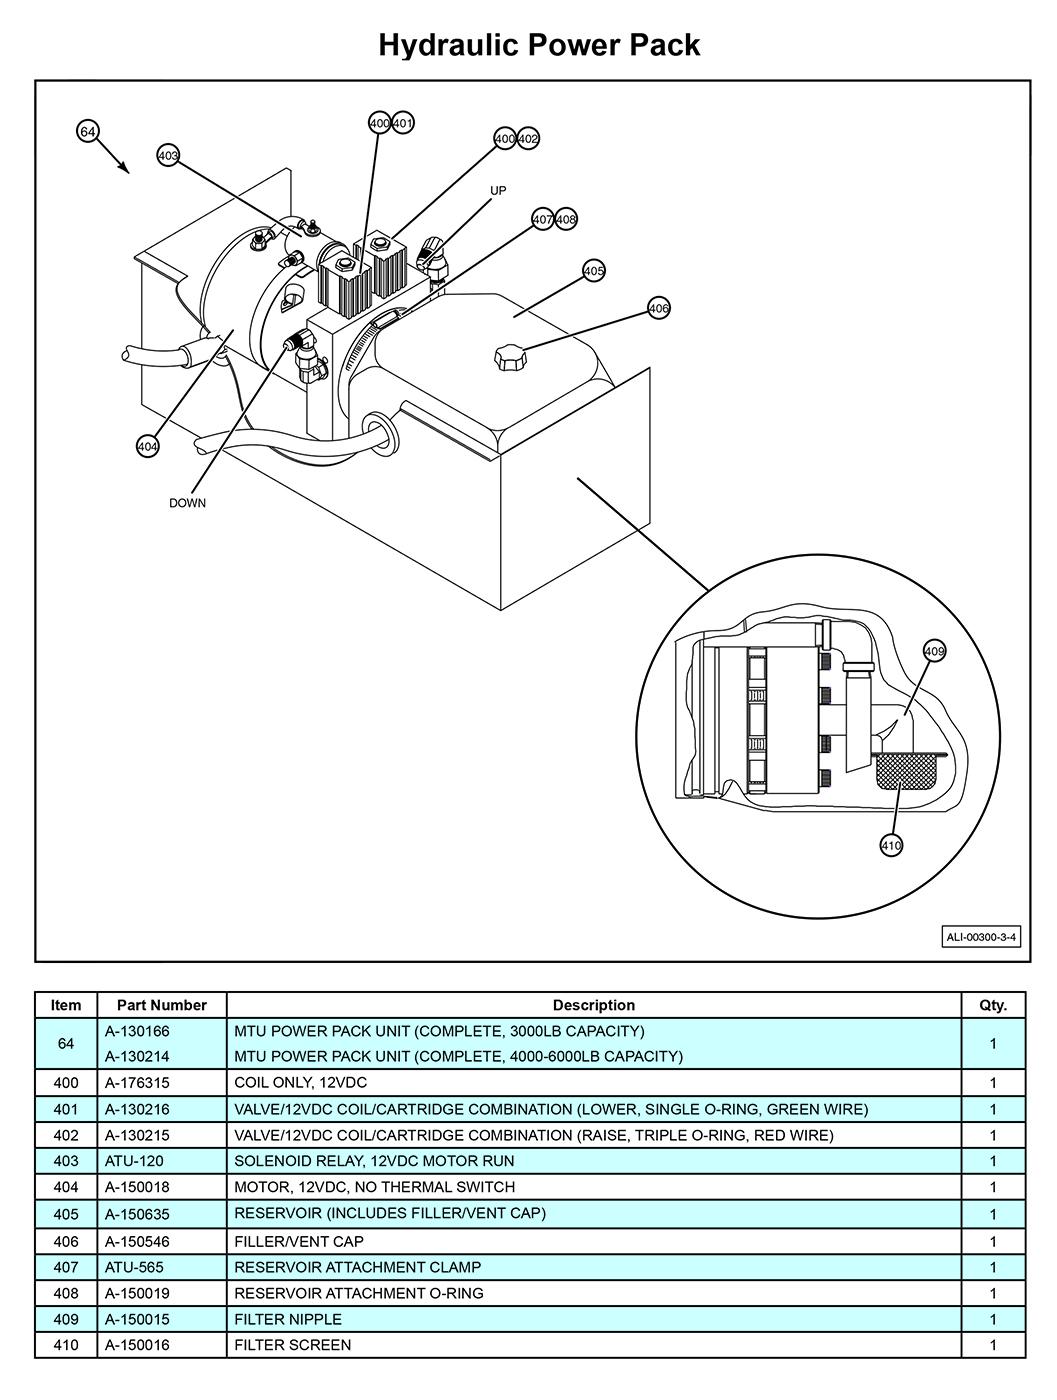 hight resolution of mtu glr 3 4 hydraulic power pack diagram